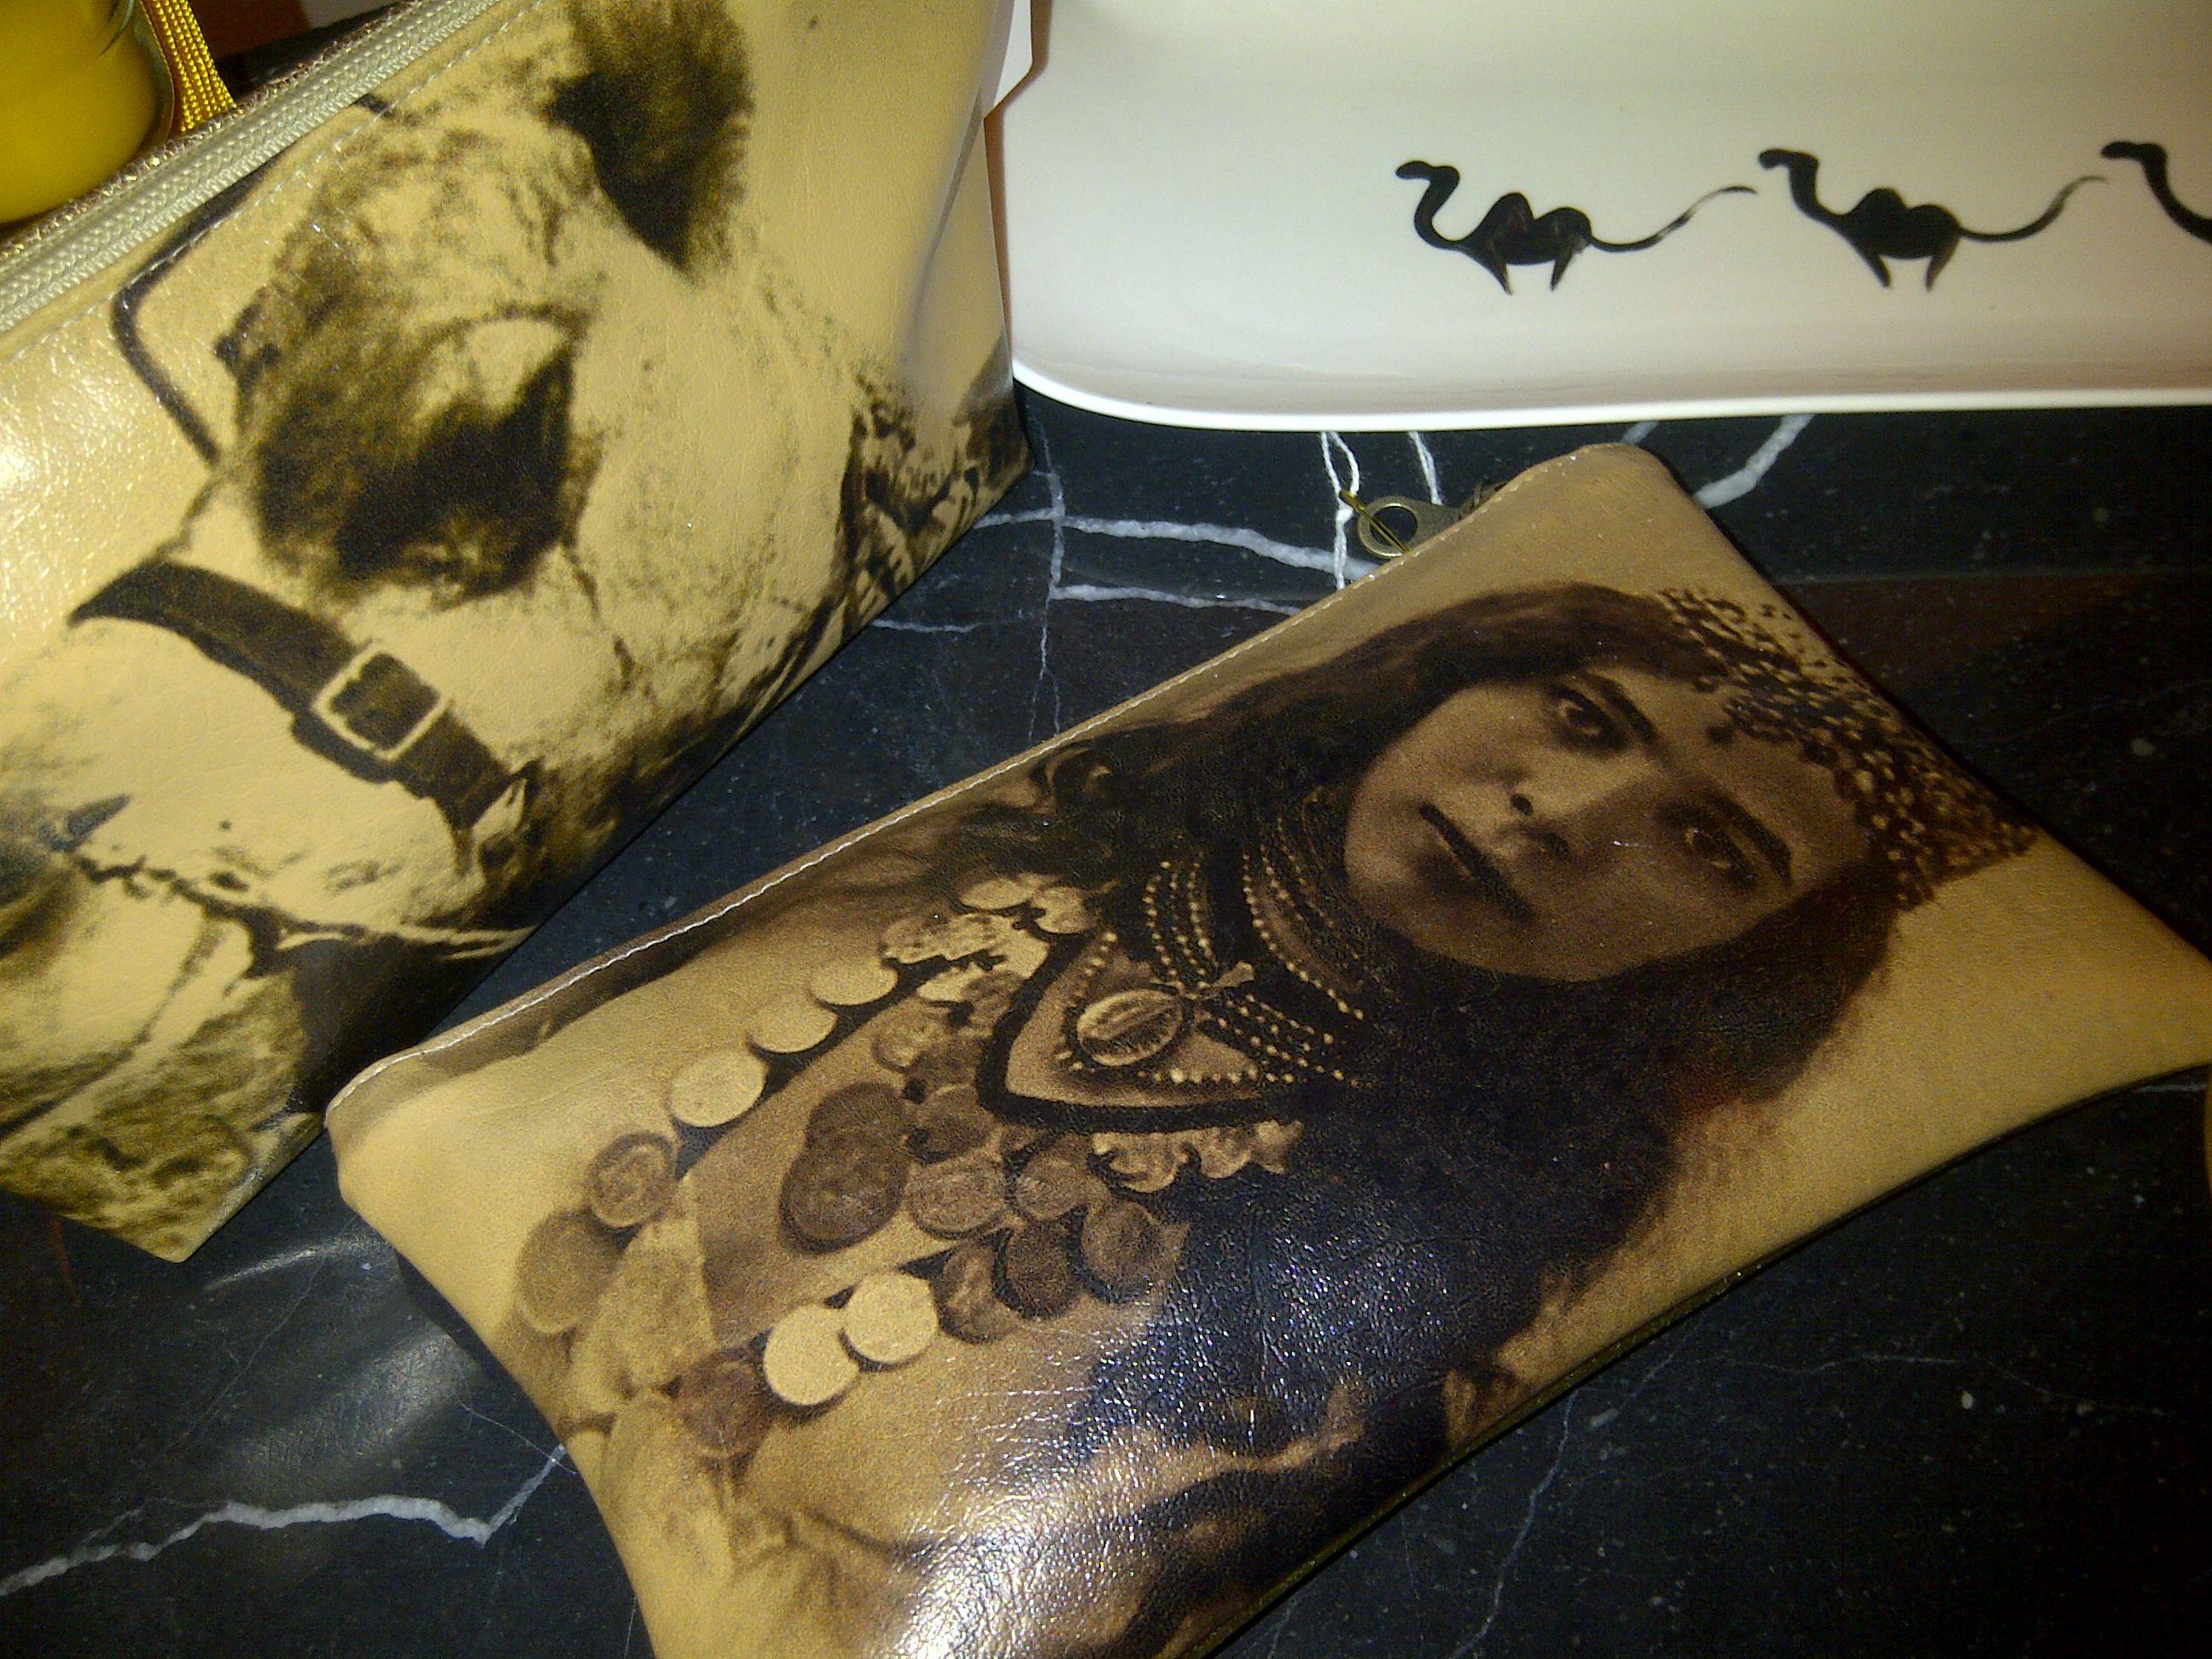 Superb souvenir or gift to ego, Modern Morocco design pochettes at KIS Boutique, Marrakech